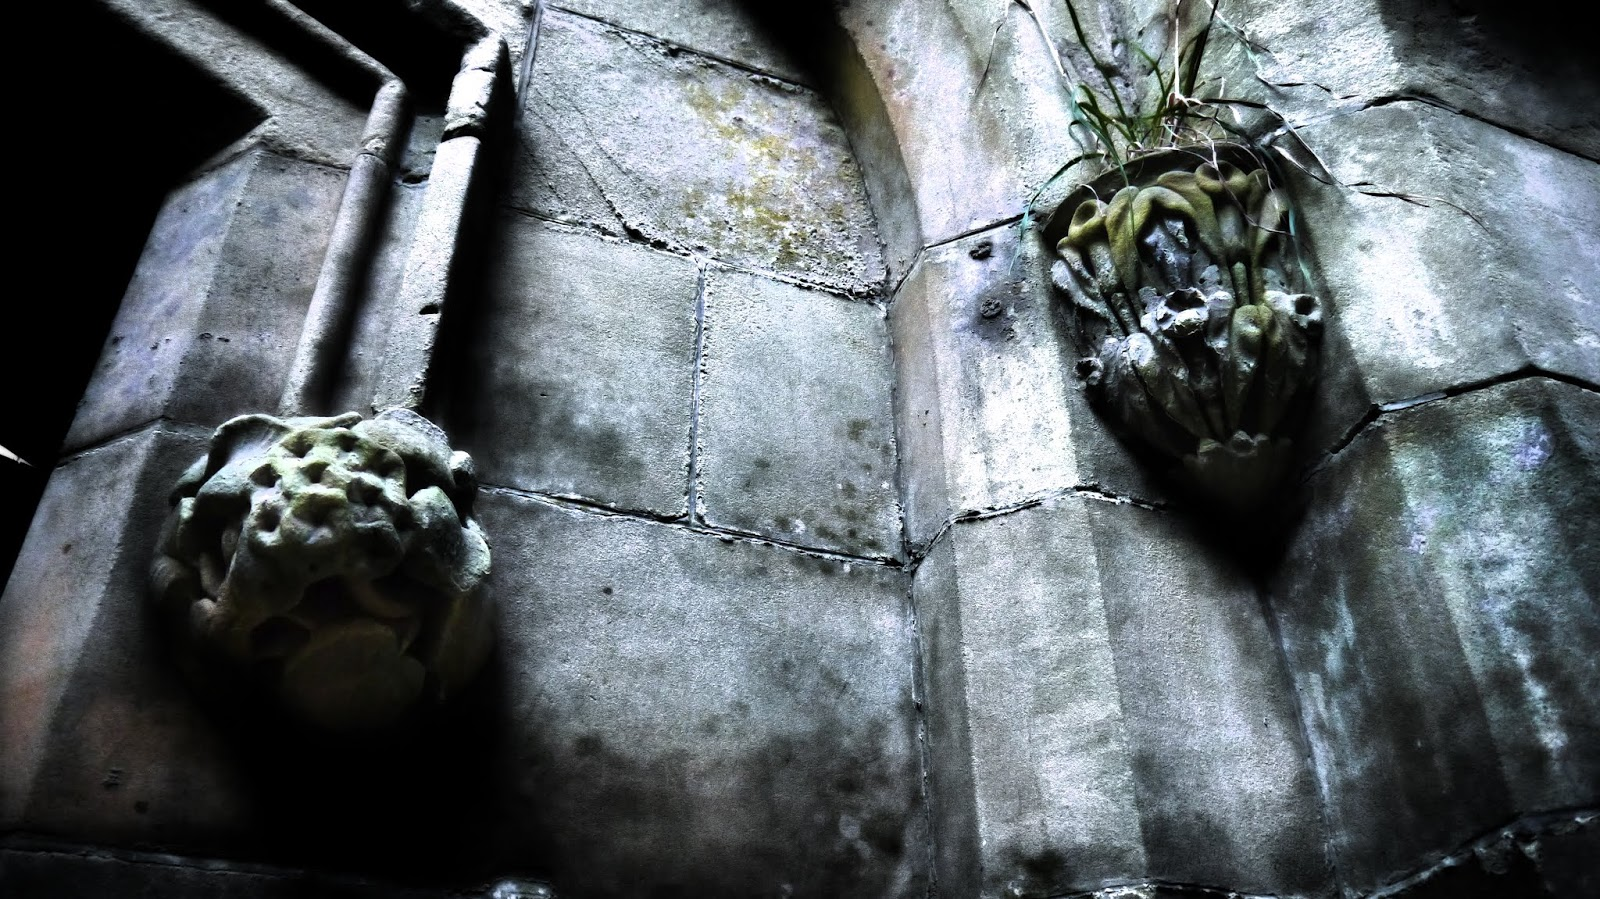 Crawford Priory Stone Details